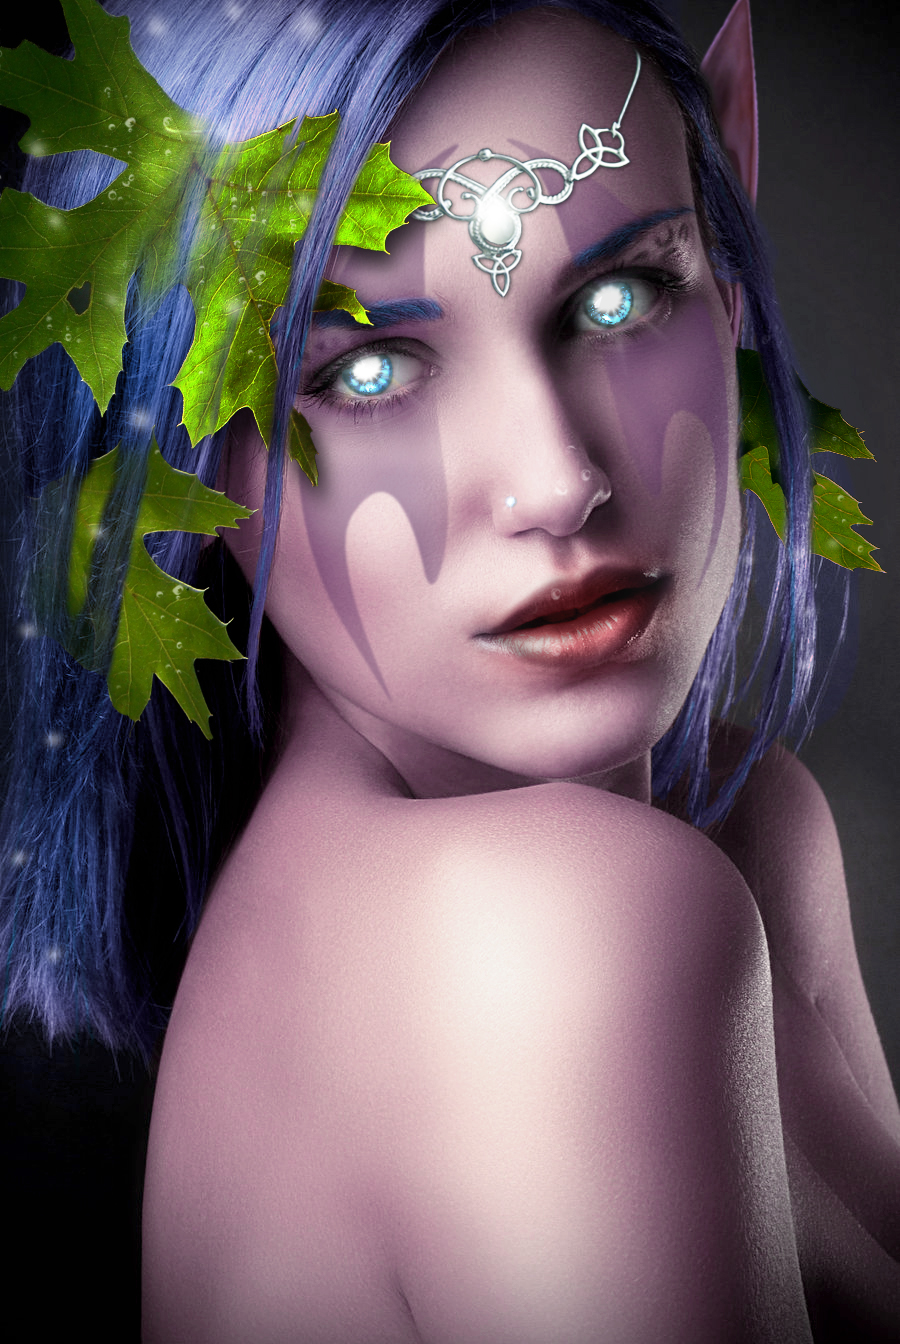 female night elf photo manipulation by fotland on deviantart